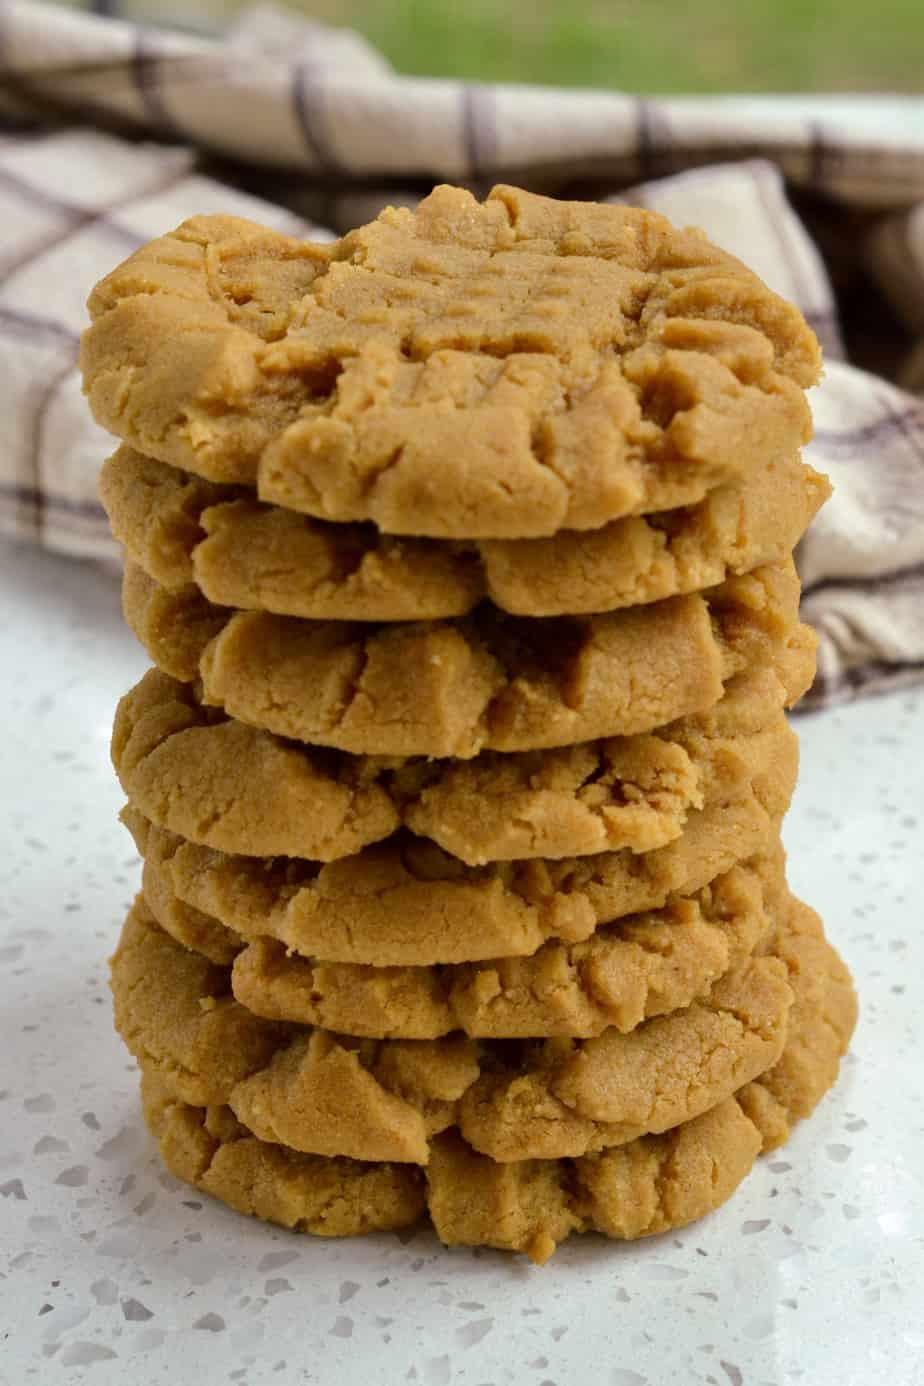 A stack of flourless peanut butter cookies